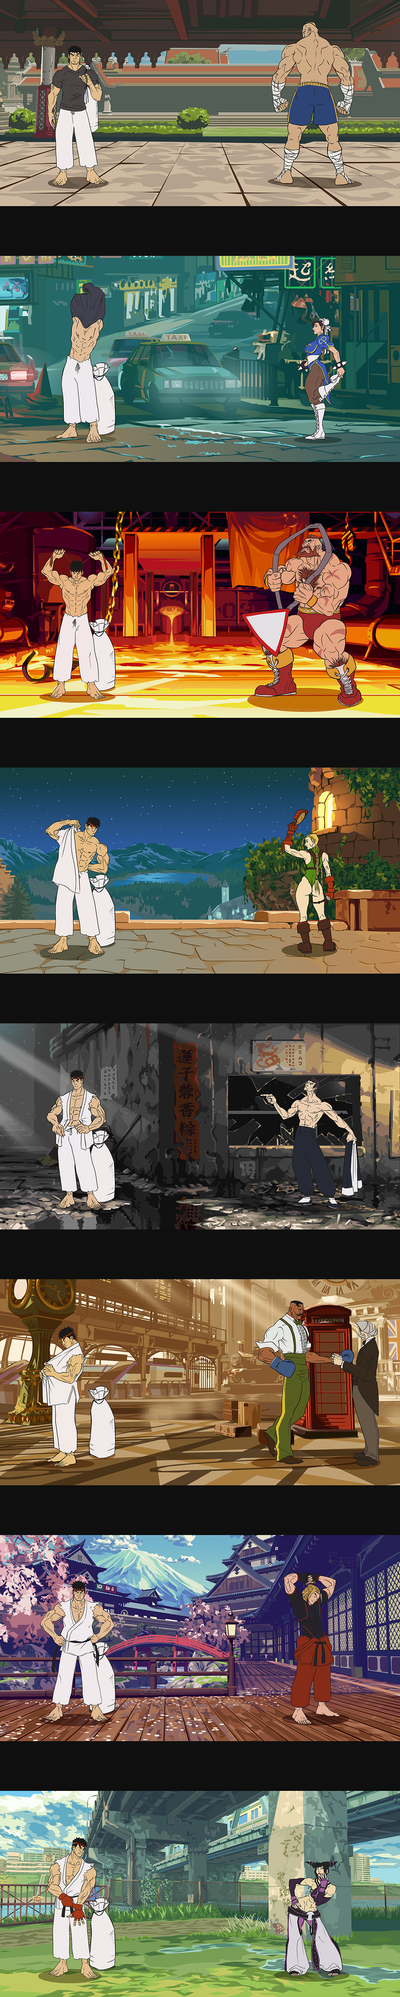 Street Fighter - Prepare for Battle by 1981kuro